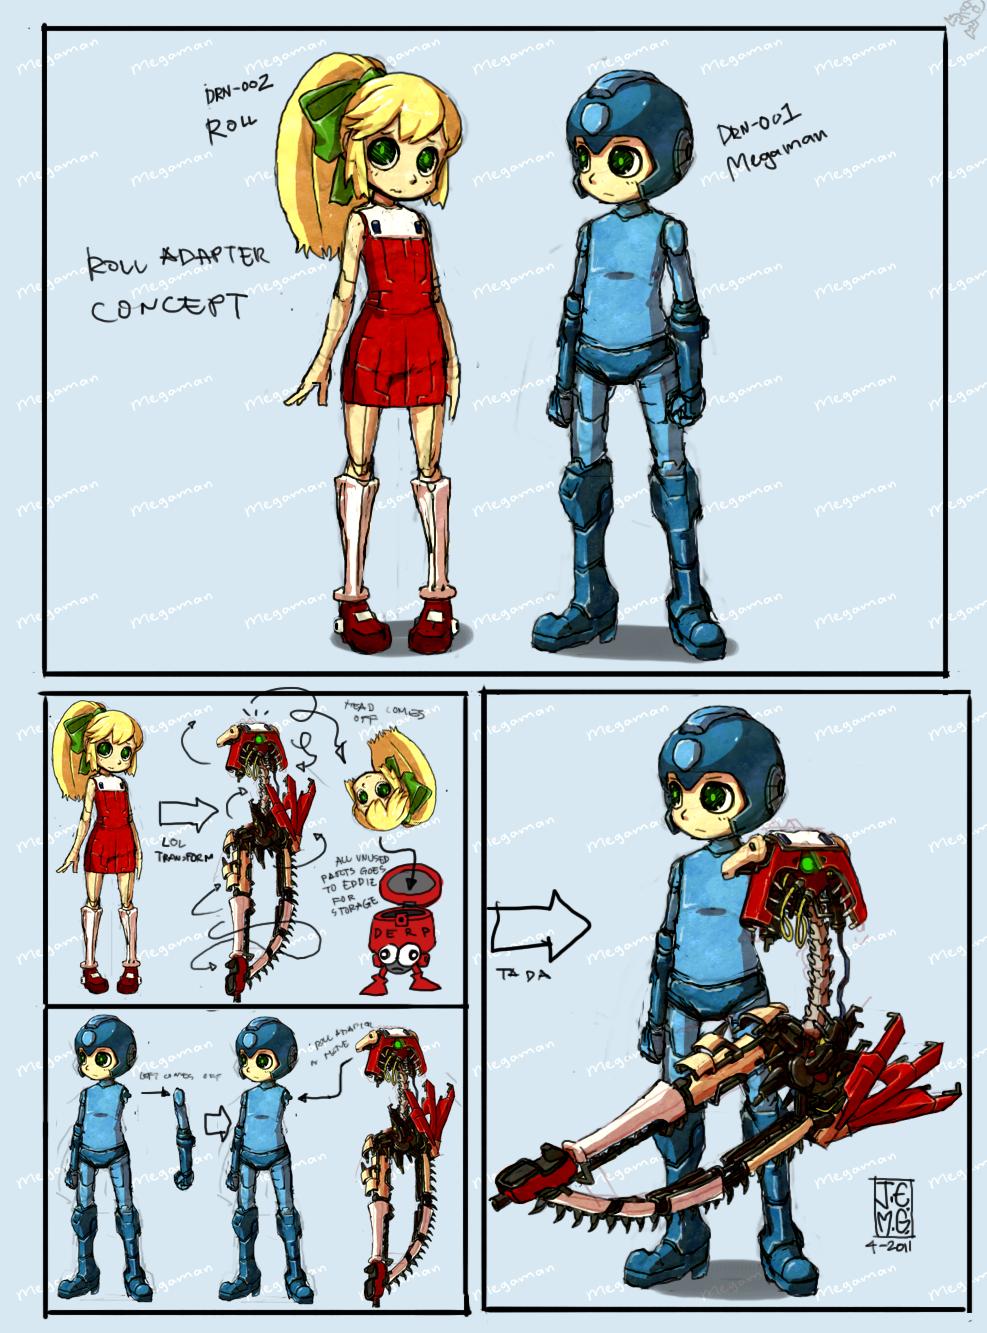 Megaman - Roll Adaptor by sachsen